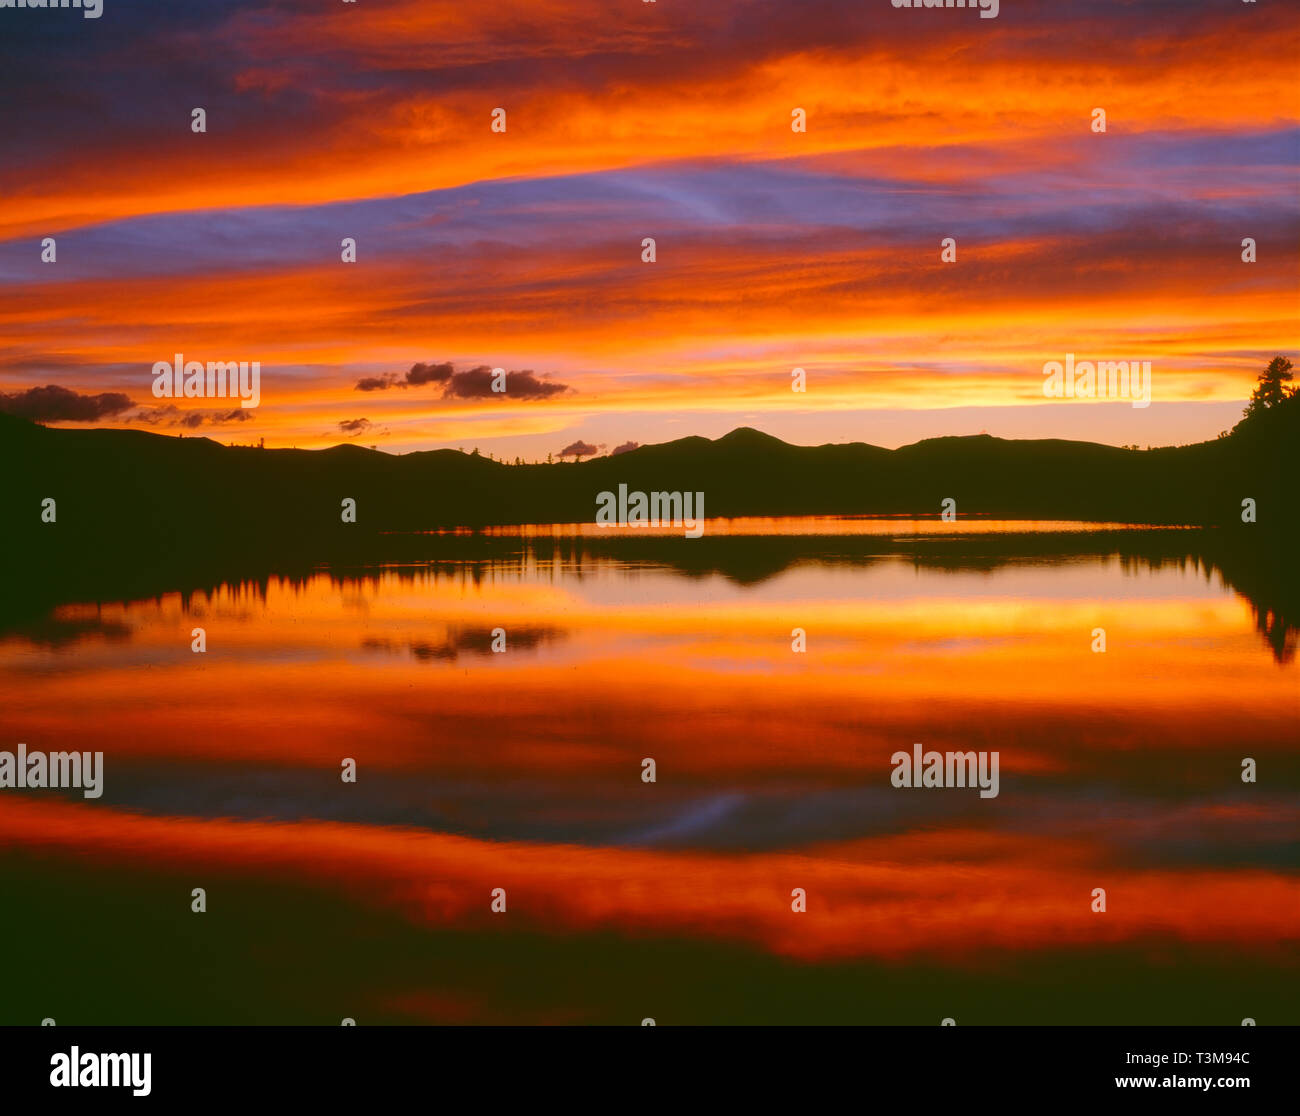 USA, Colorado, Arapaho National Forest, Sunset ignites the sky over Echo Lake.. - Stock Image